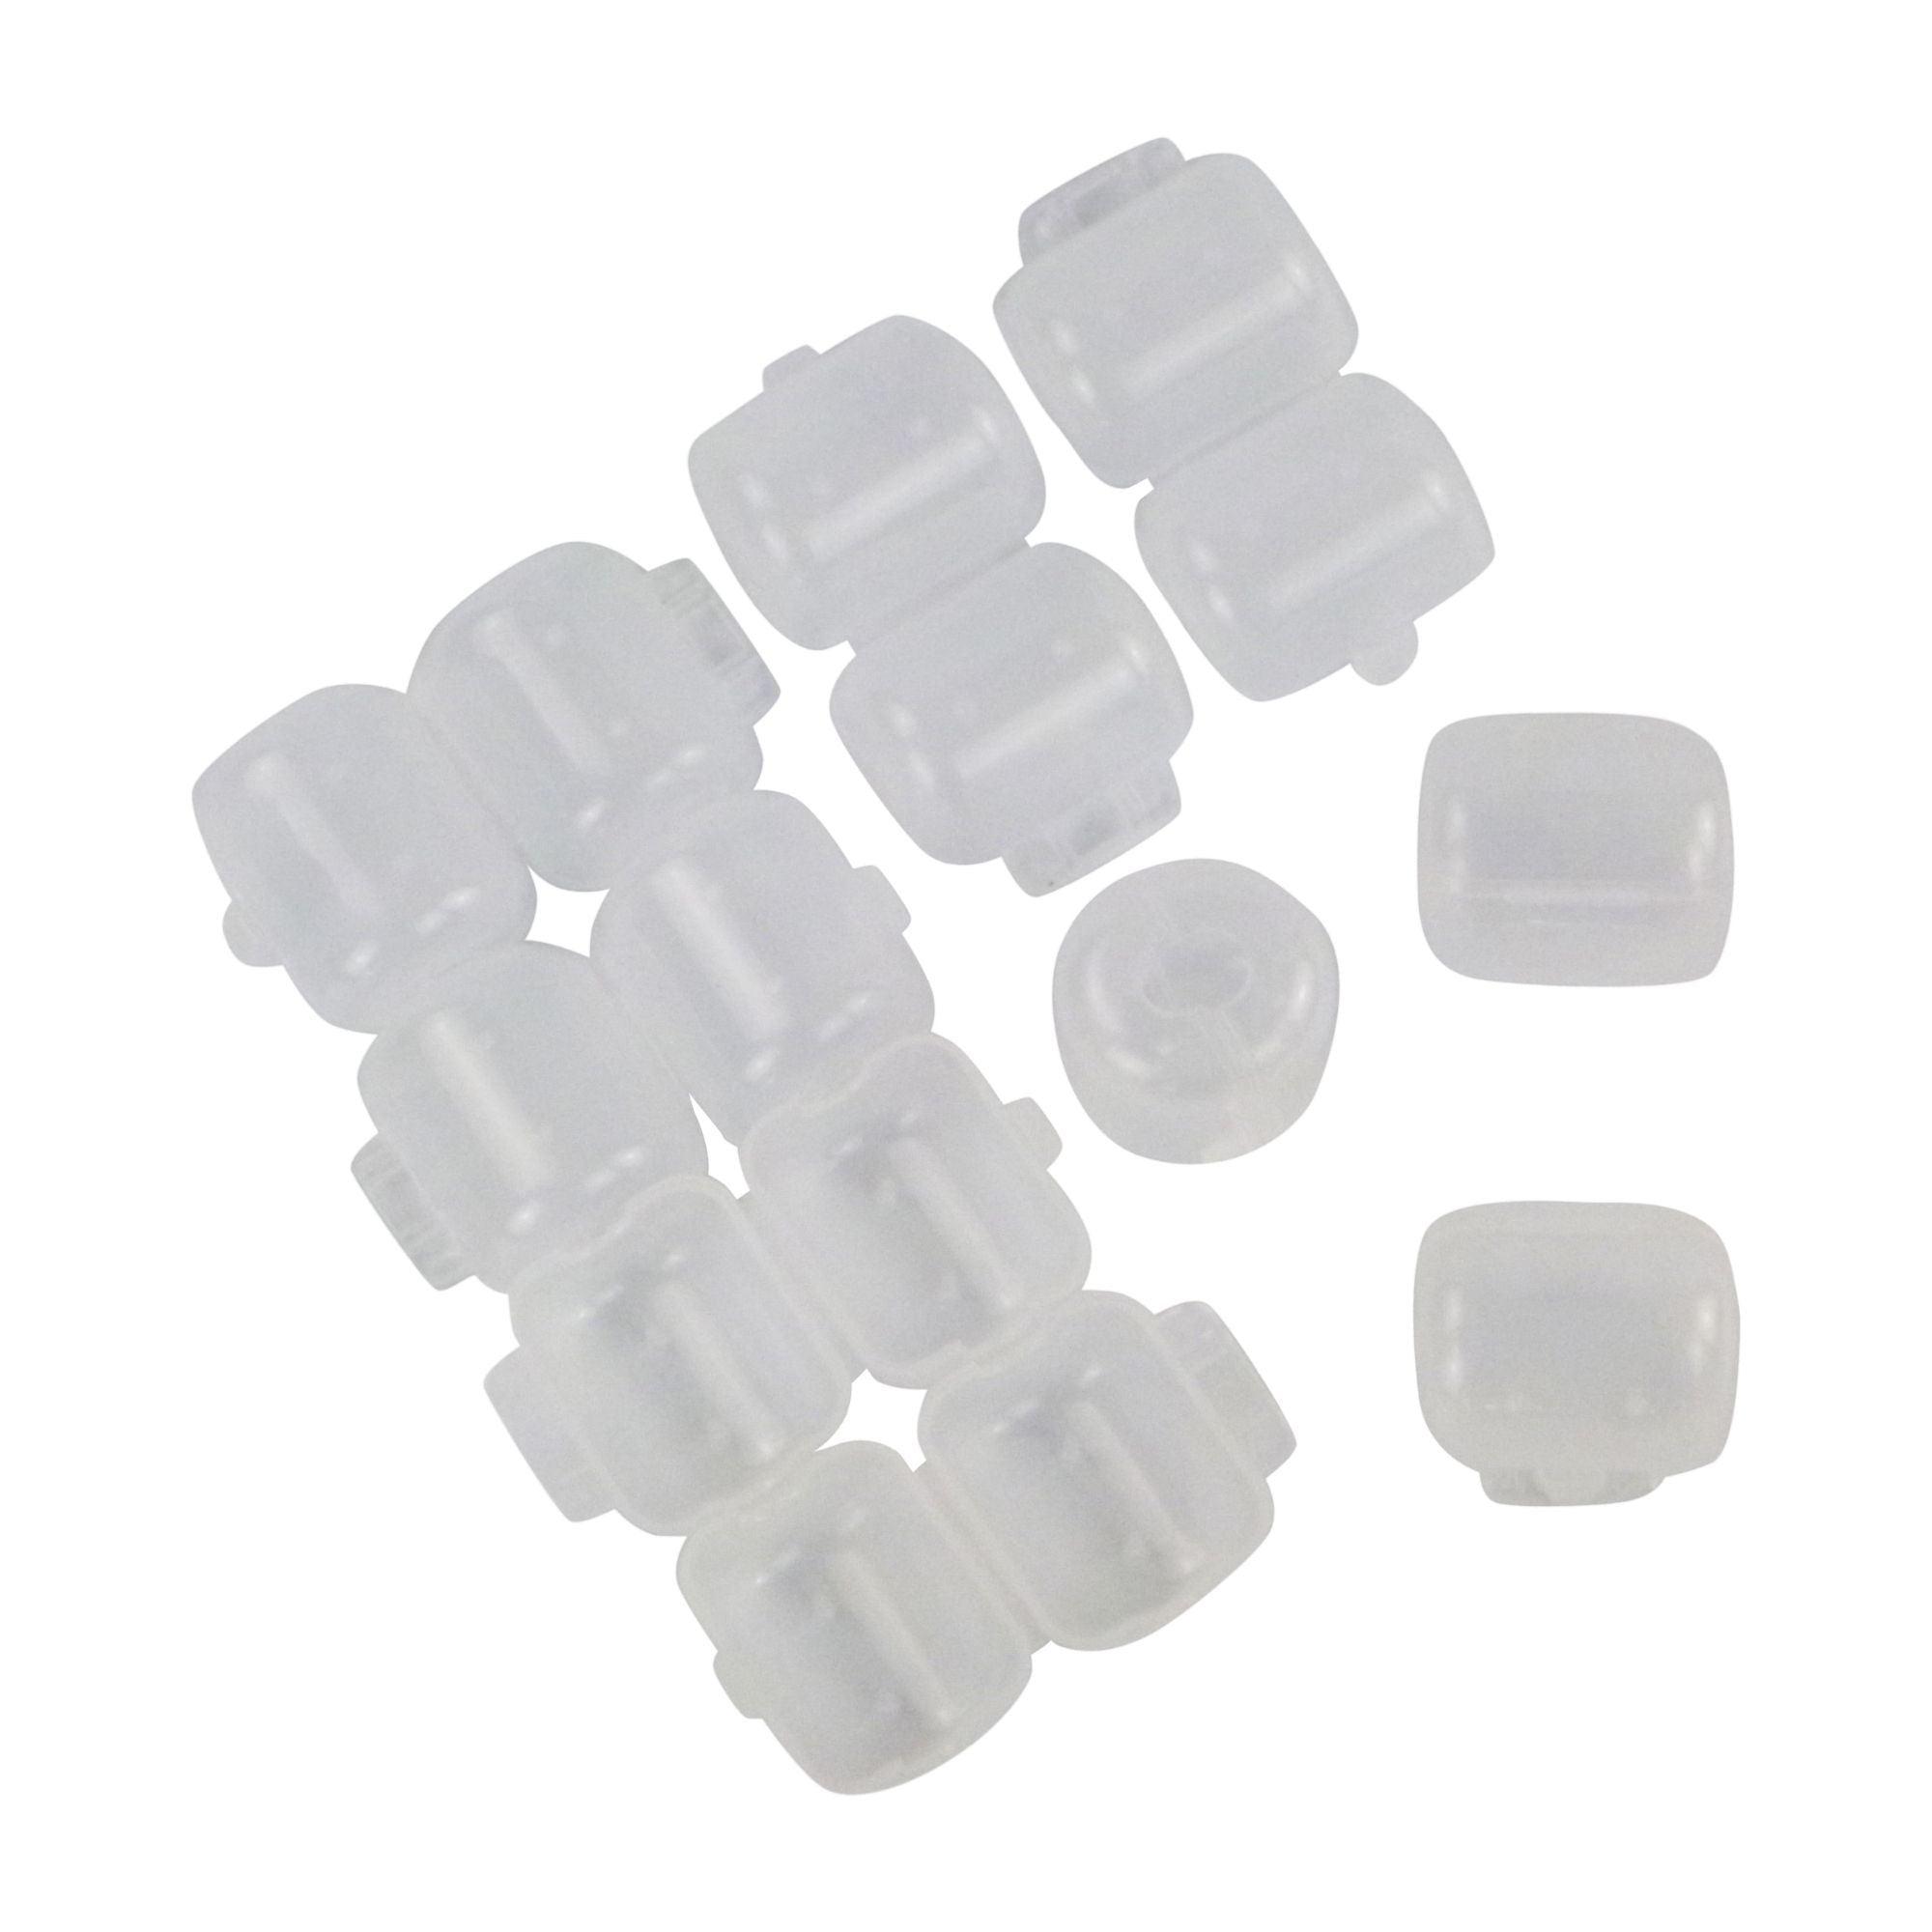 Rig Ezy Squid Jig Covers, 9 pack